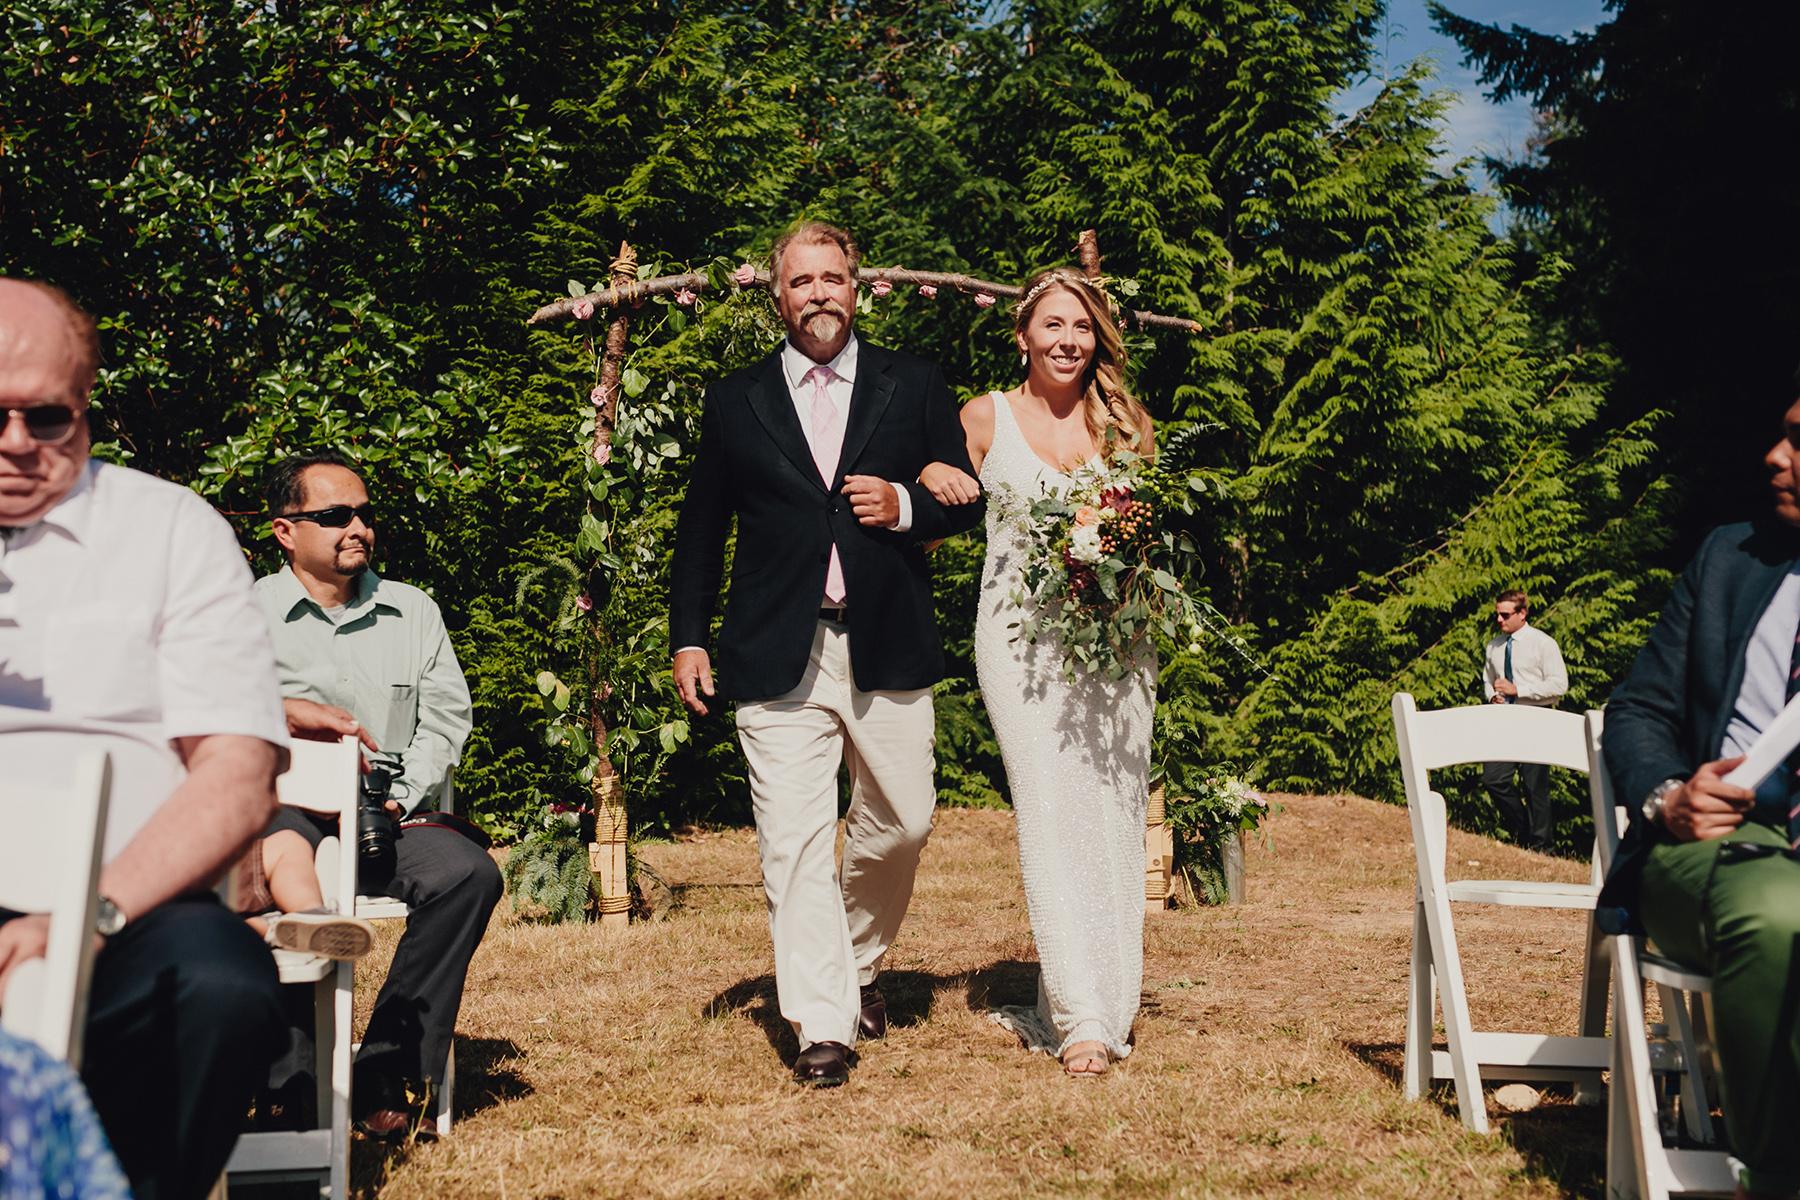 bodega-ridge-wedding-photos-0060.jpg